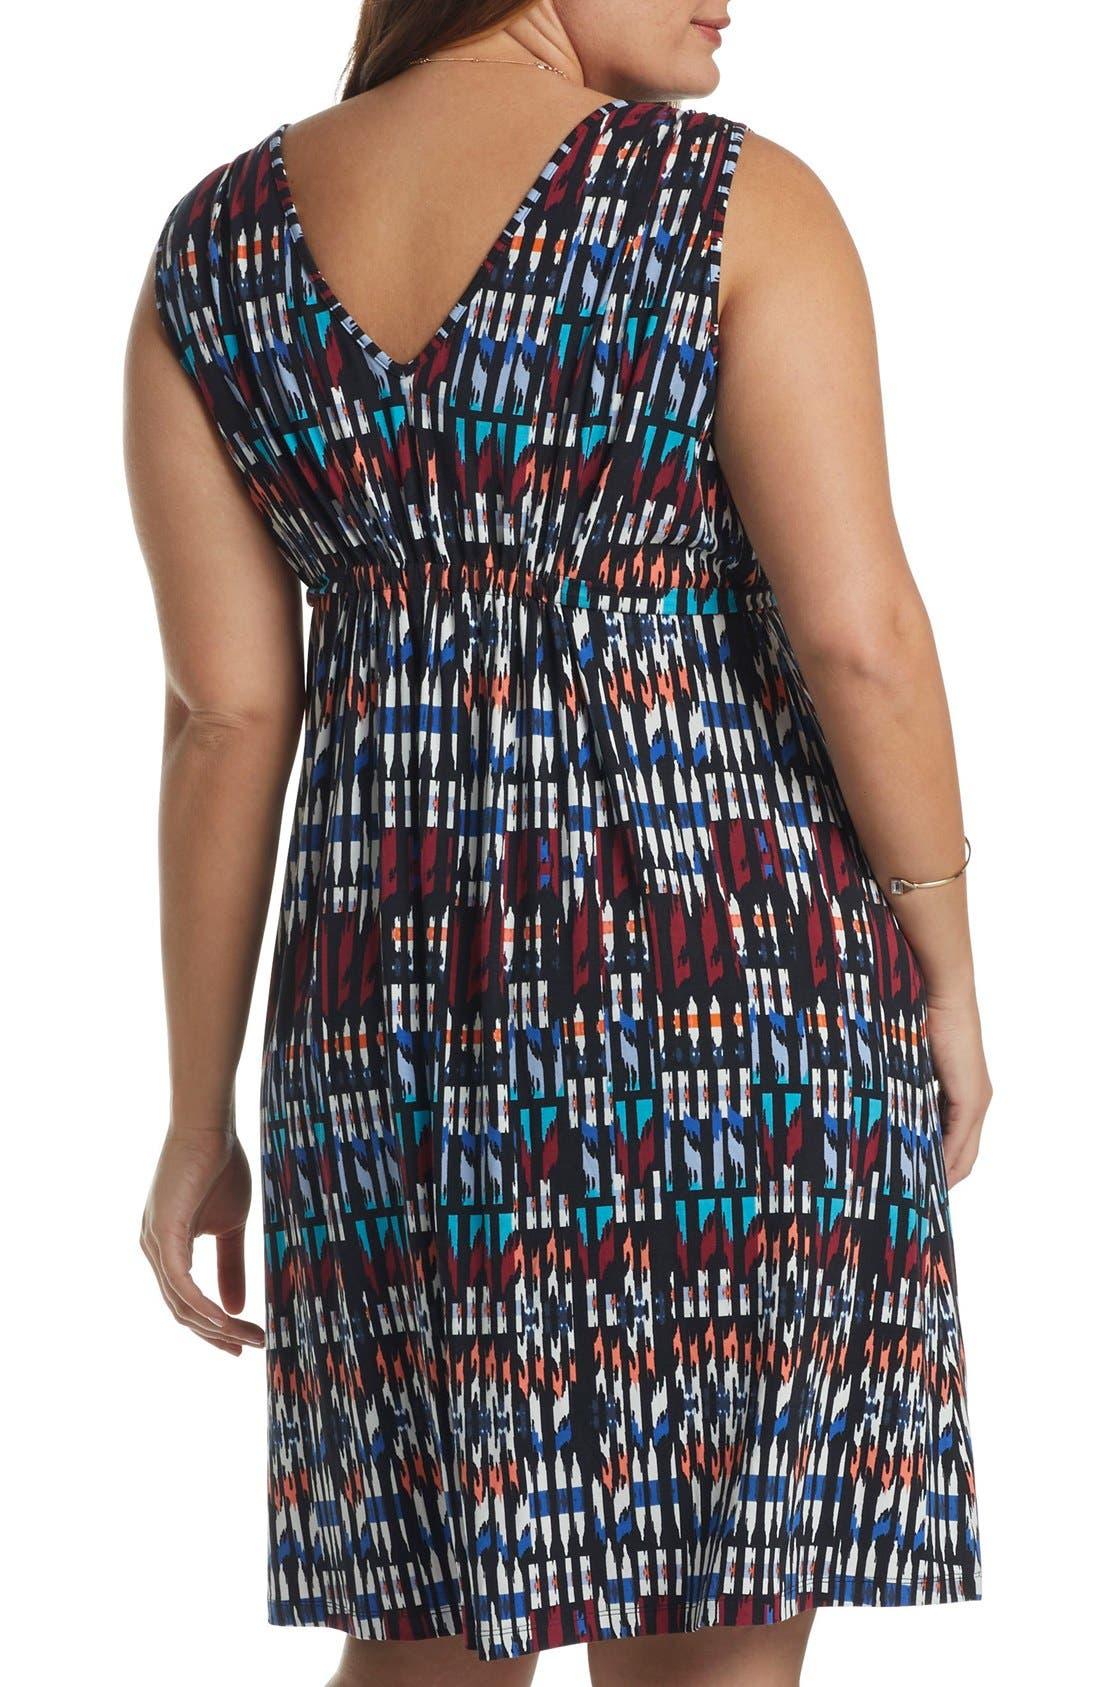 Grecia Jersey Dress,                             Alternate thumbnail 3, color,                             005